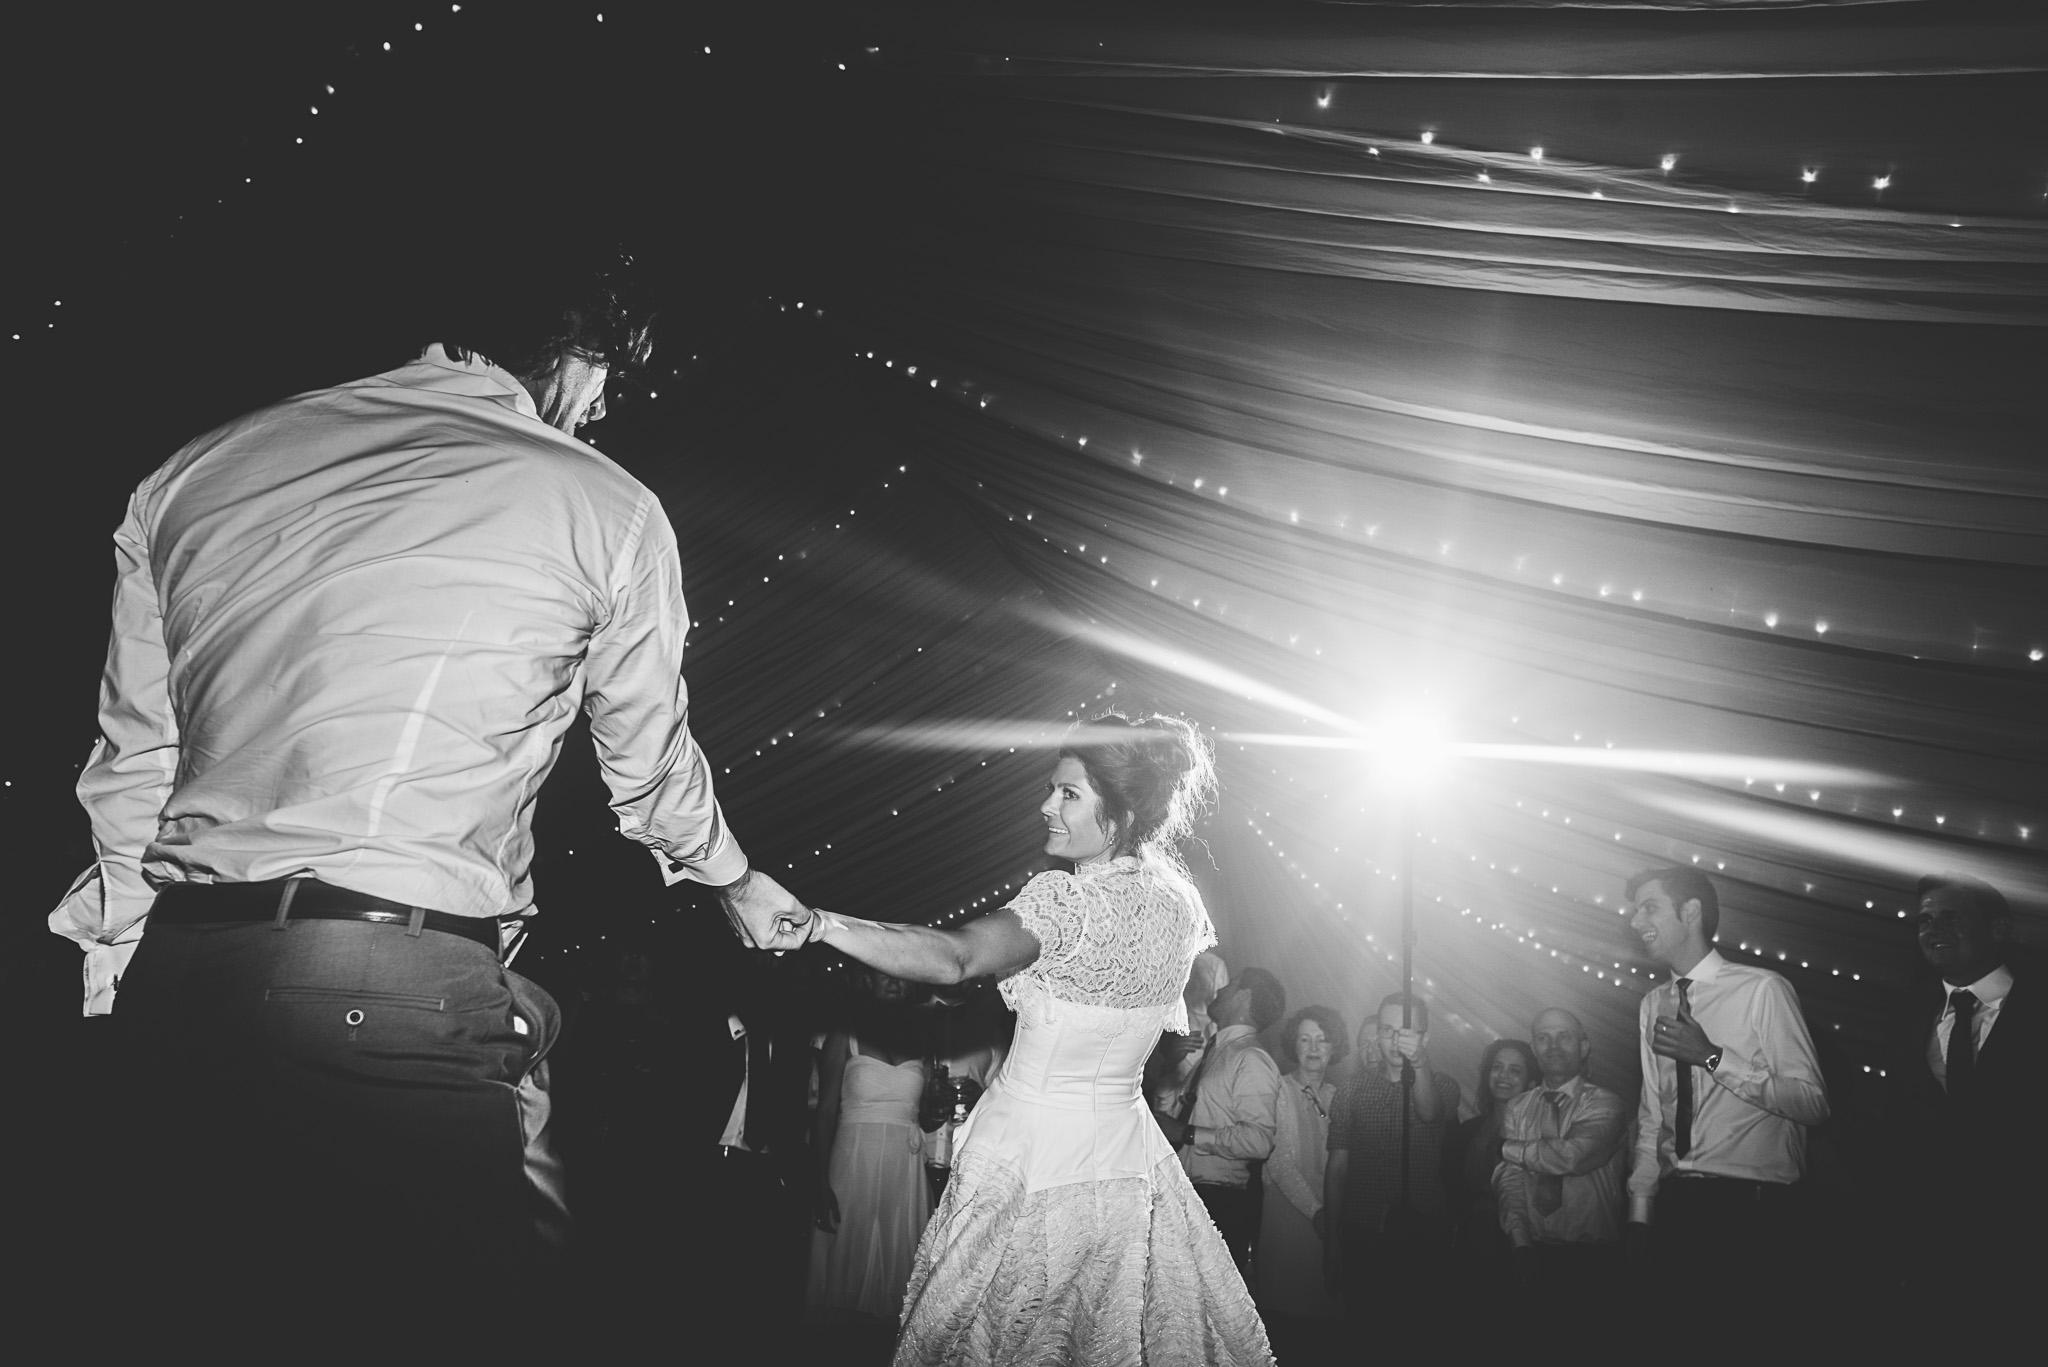 Lara & Jack Wedding 220815 by Barney Walters_1062_BW2_1098